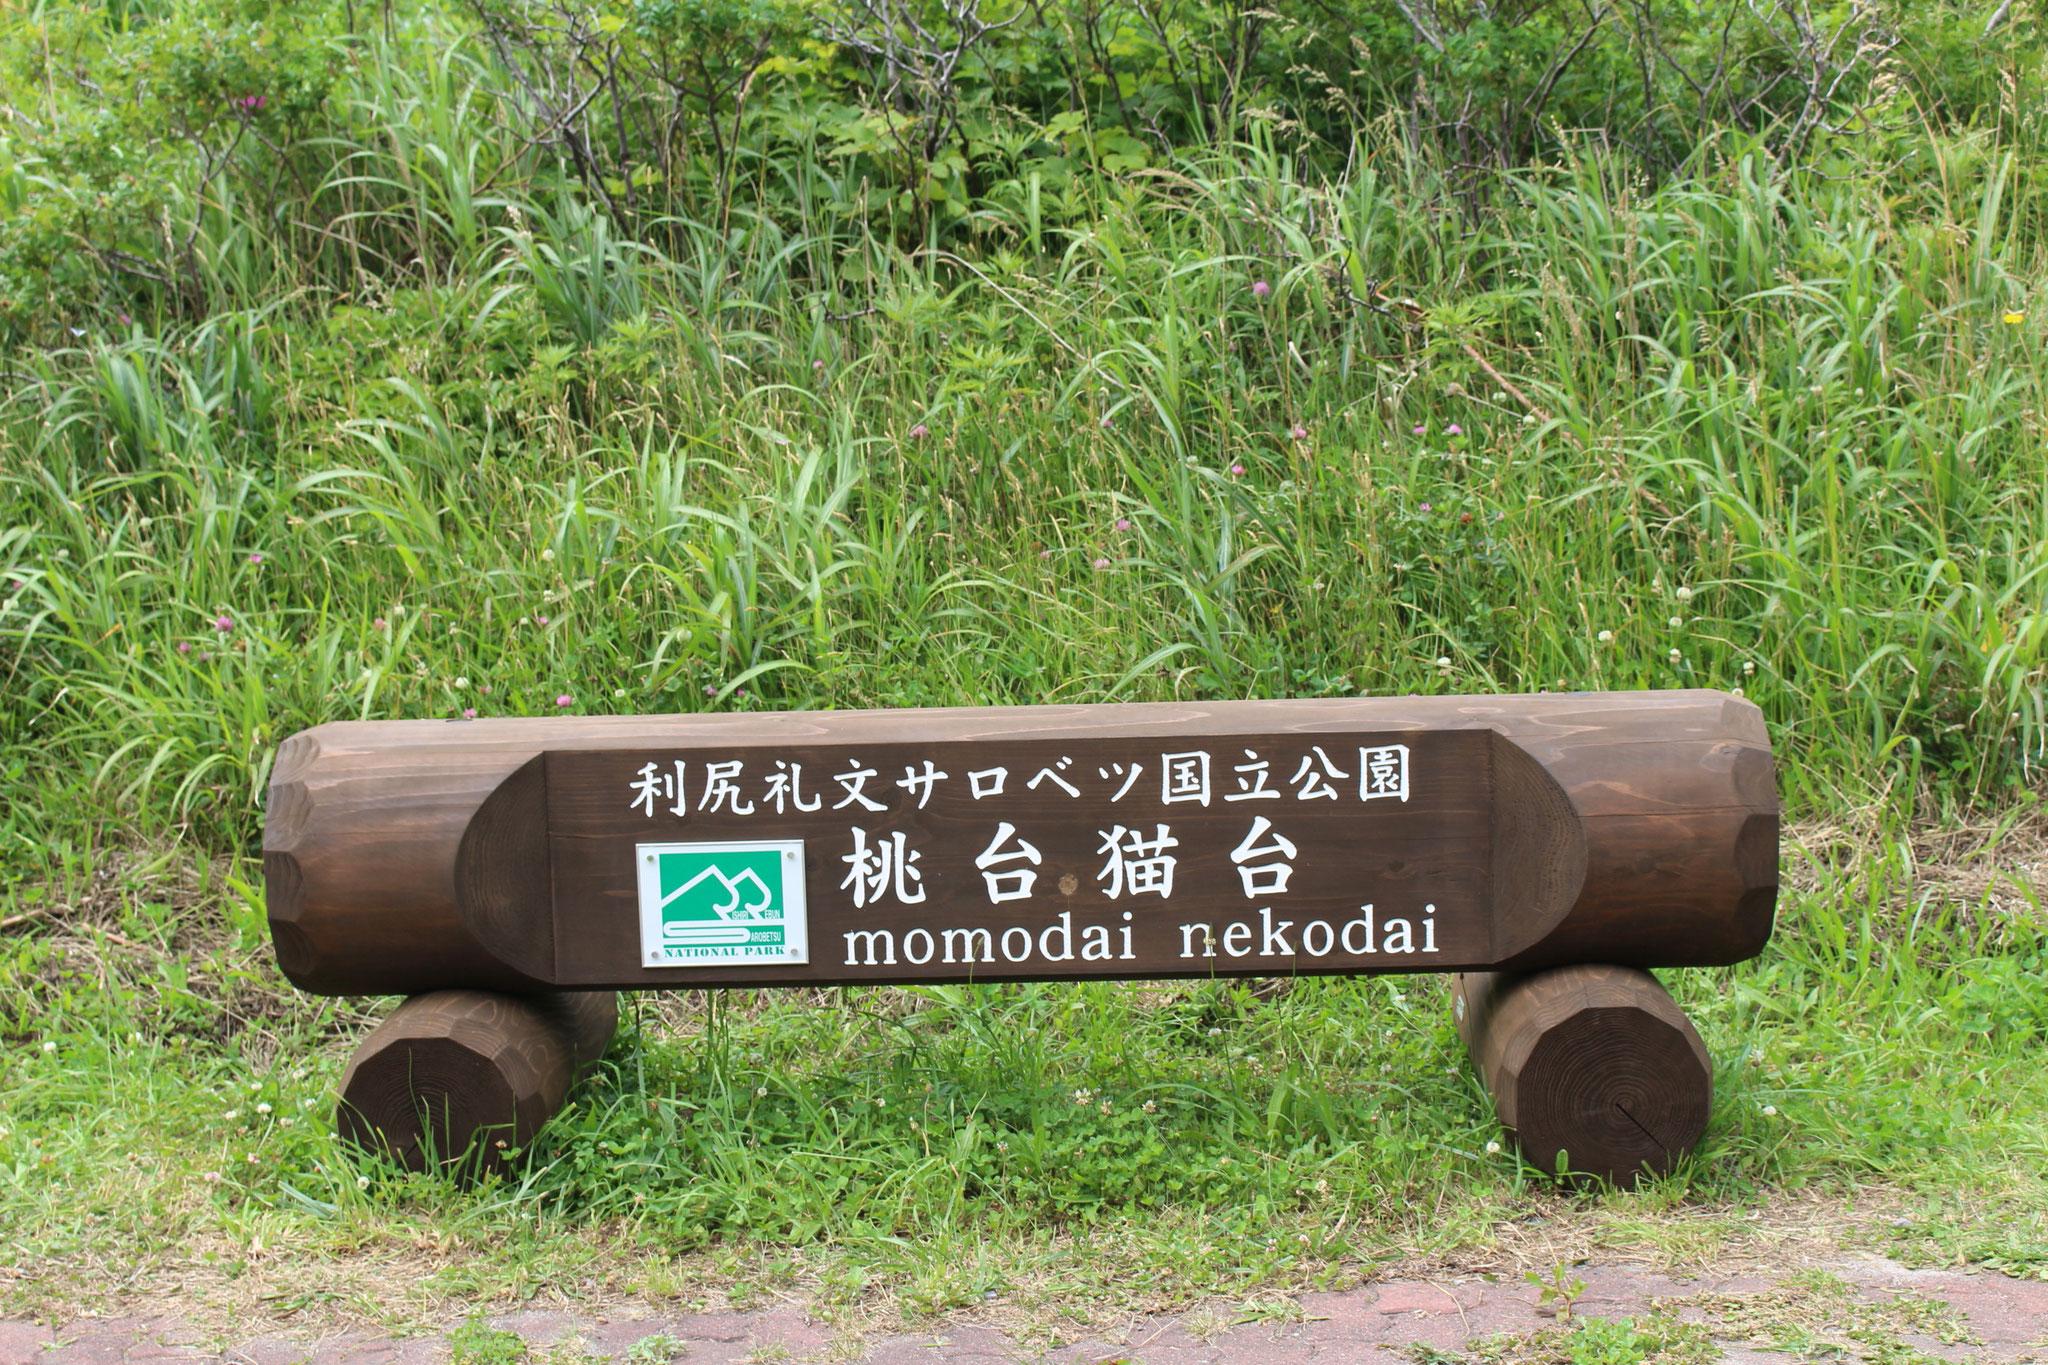 桃台 猫台「利尻礼文サロッペ国立公園」